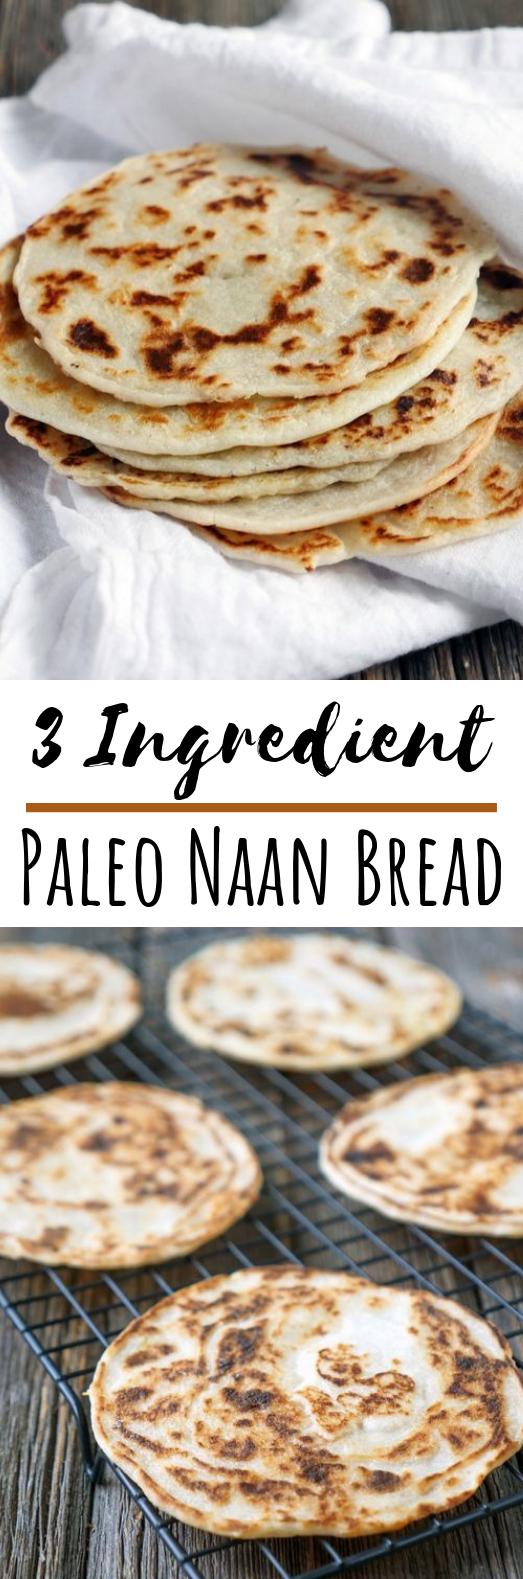 3 Ingredient Paleo Naan Bread #paleo #healthy